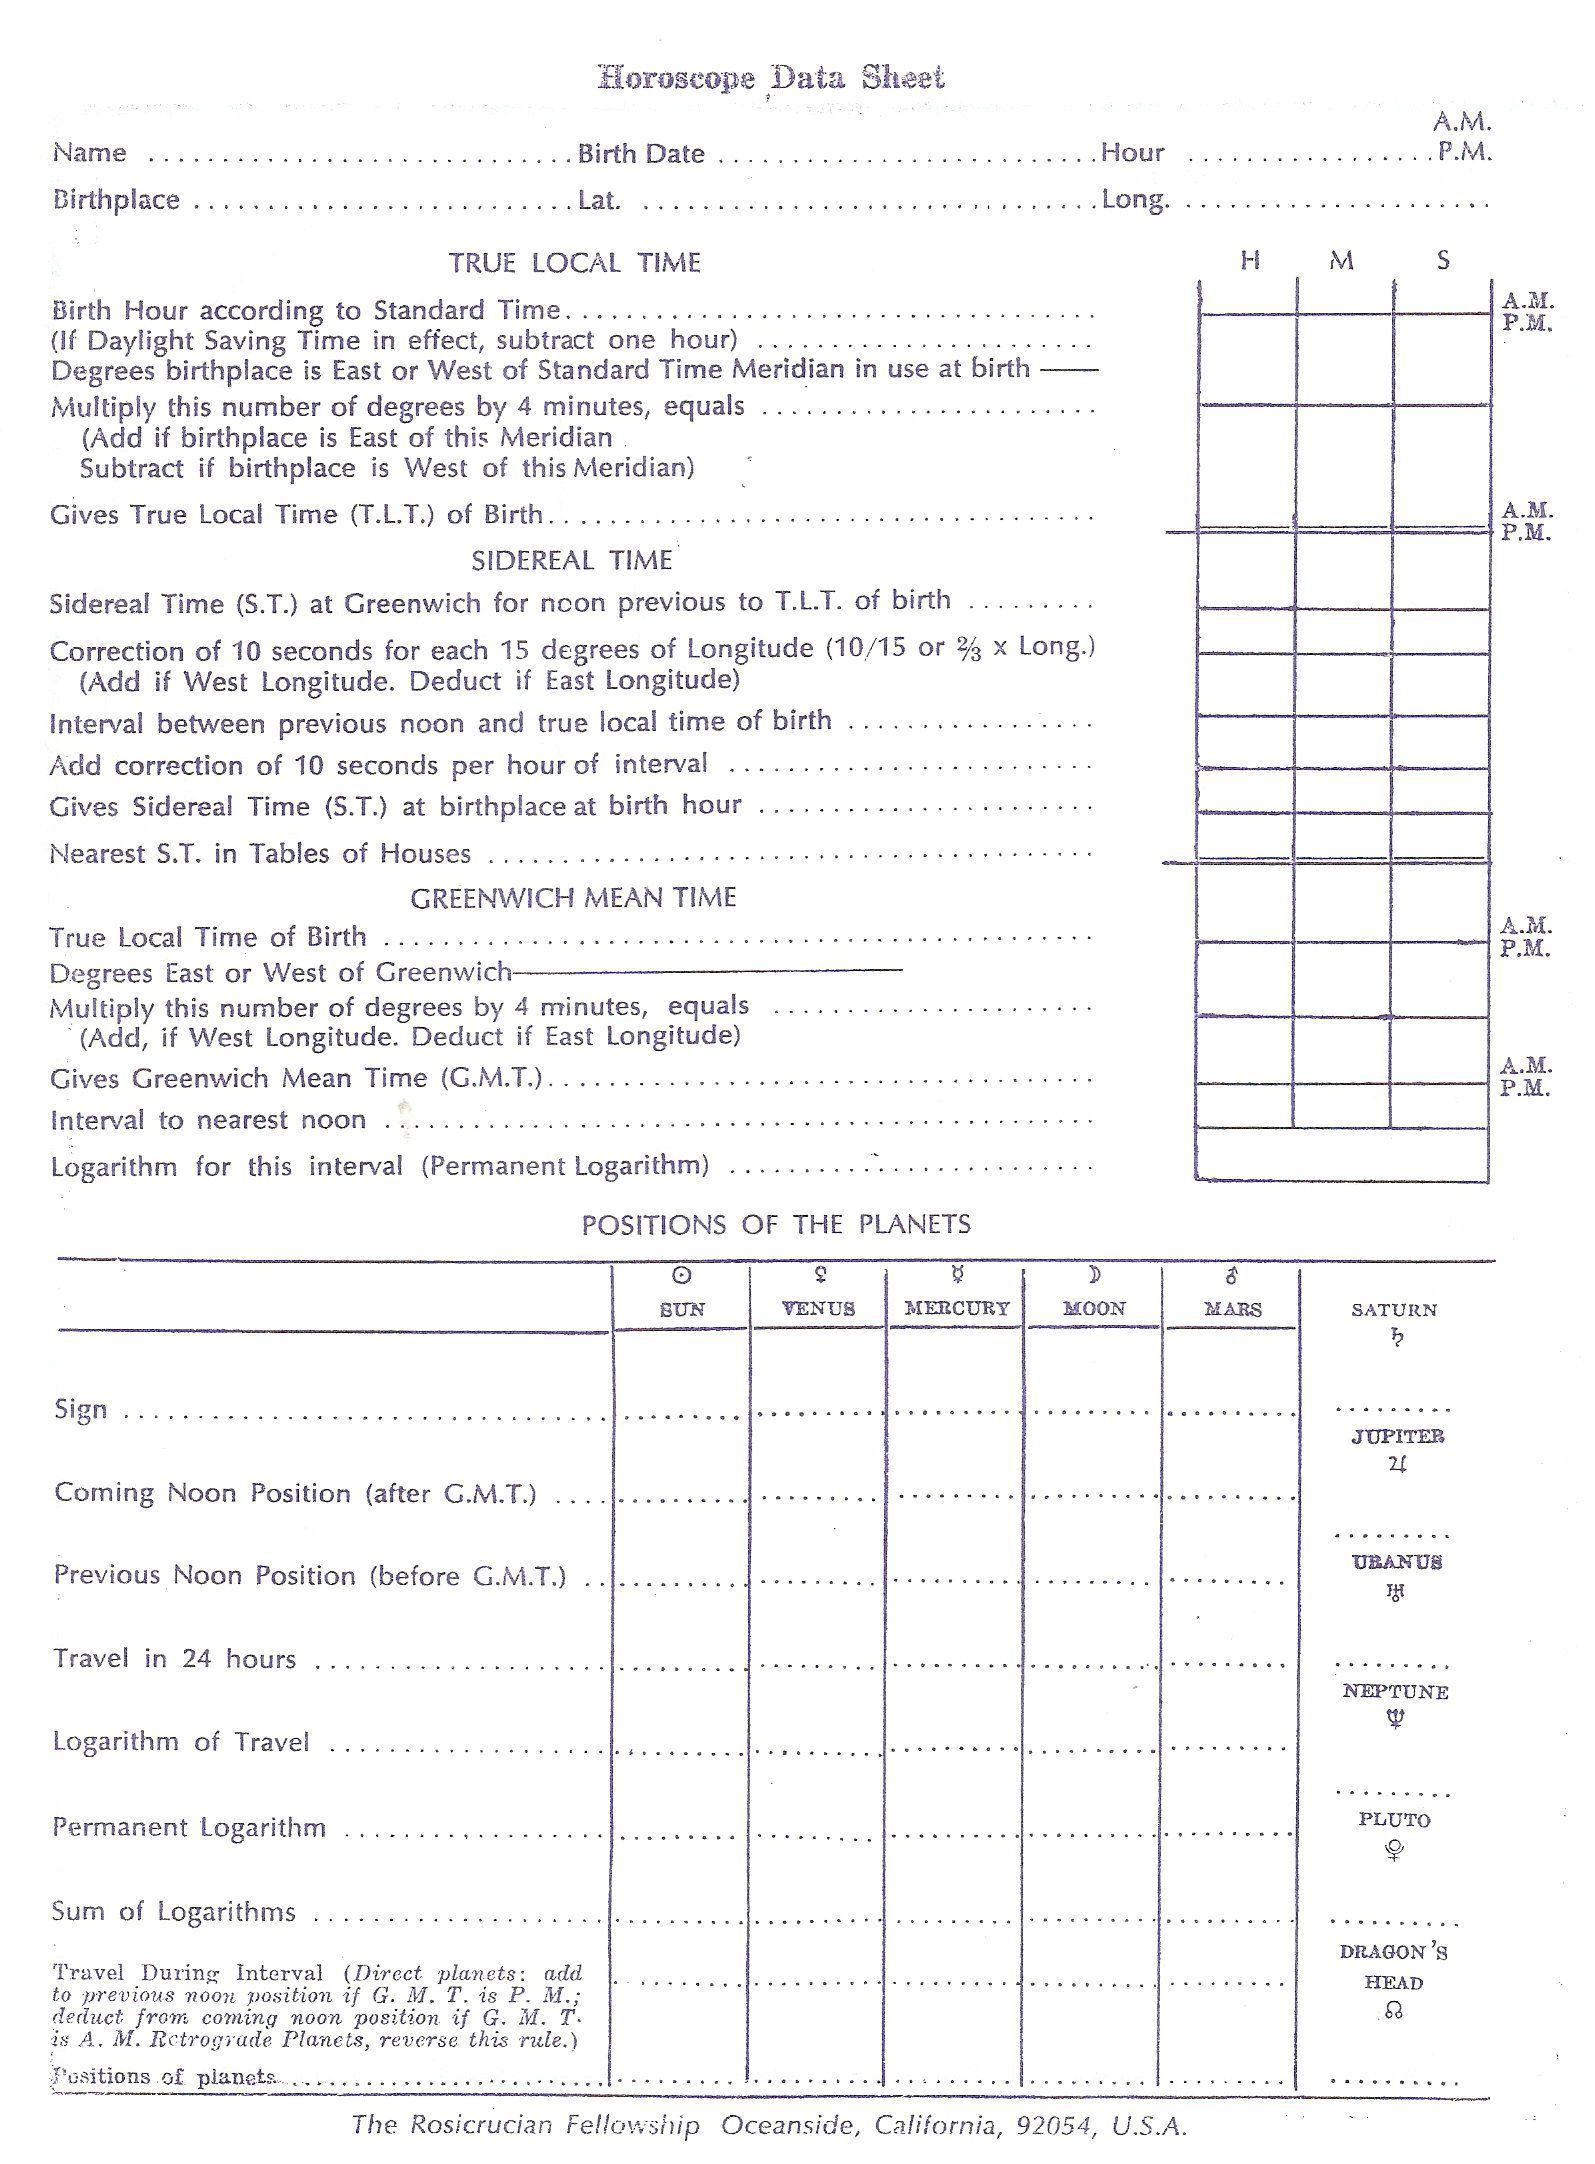 Blank Astrology Chart Ibovnathandedecker